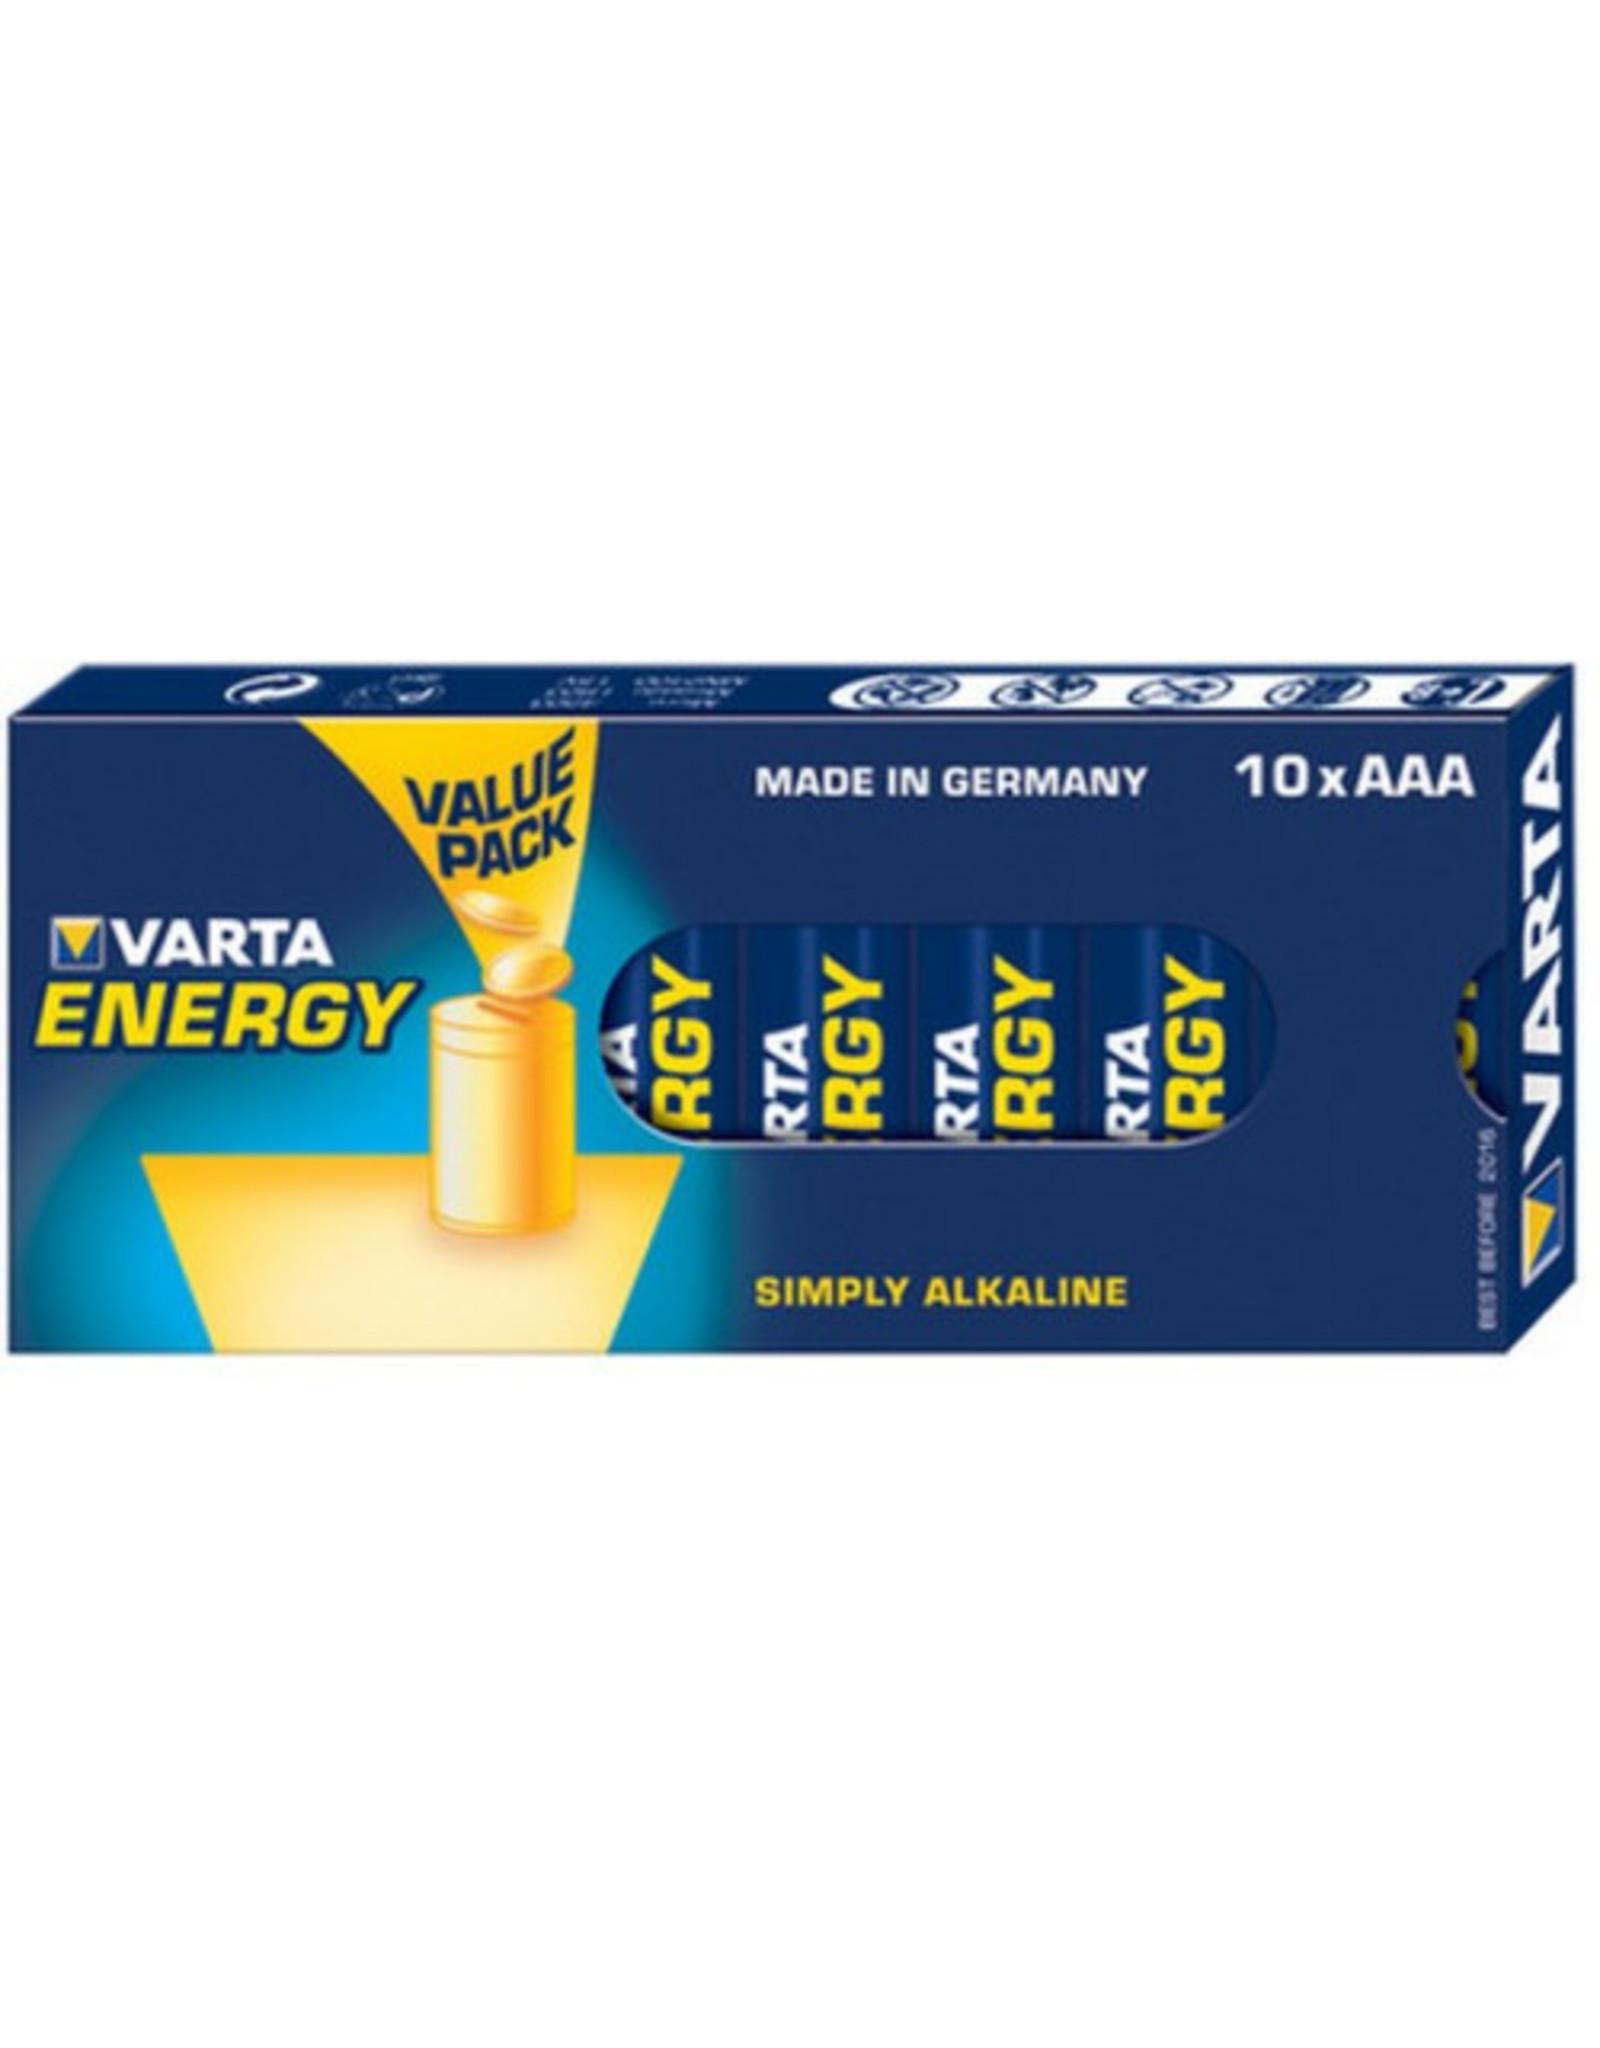 Varta Energy - Battery - 10xAAA - LR6